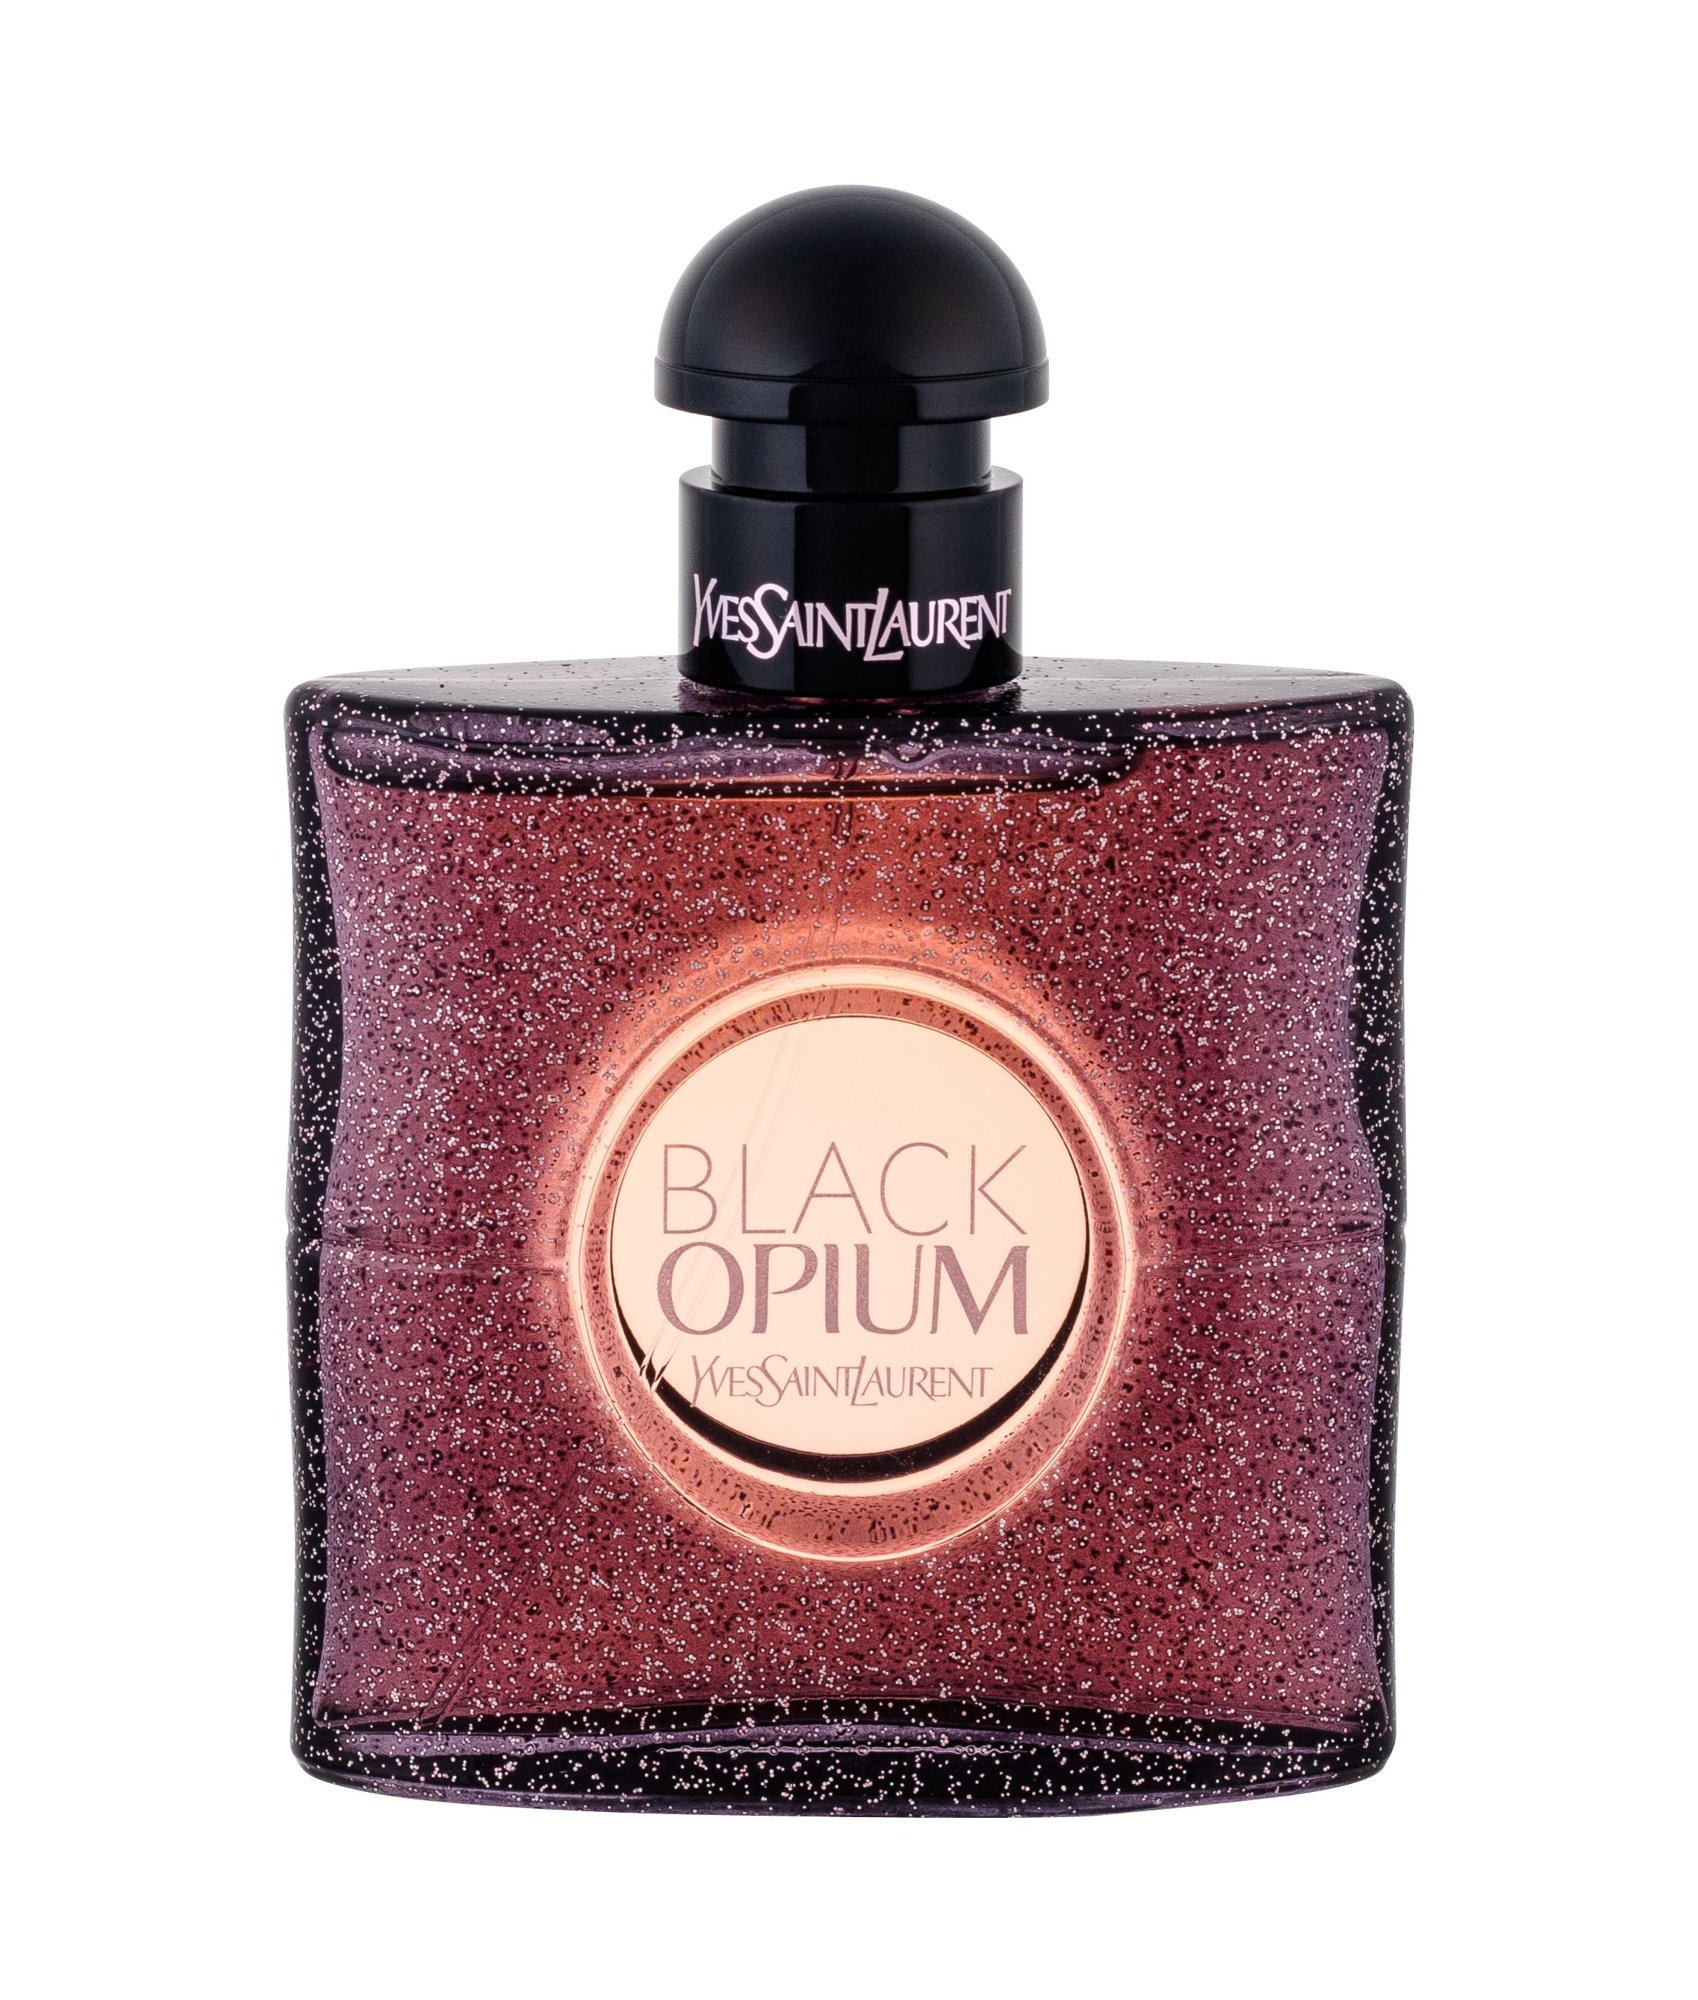 Yves Saint Laurent Black Opium, Toaletní voda 7.5ml